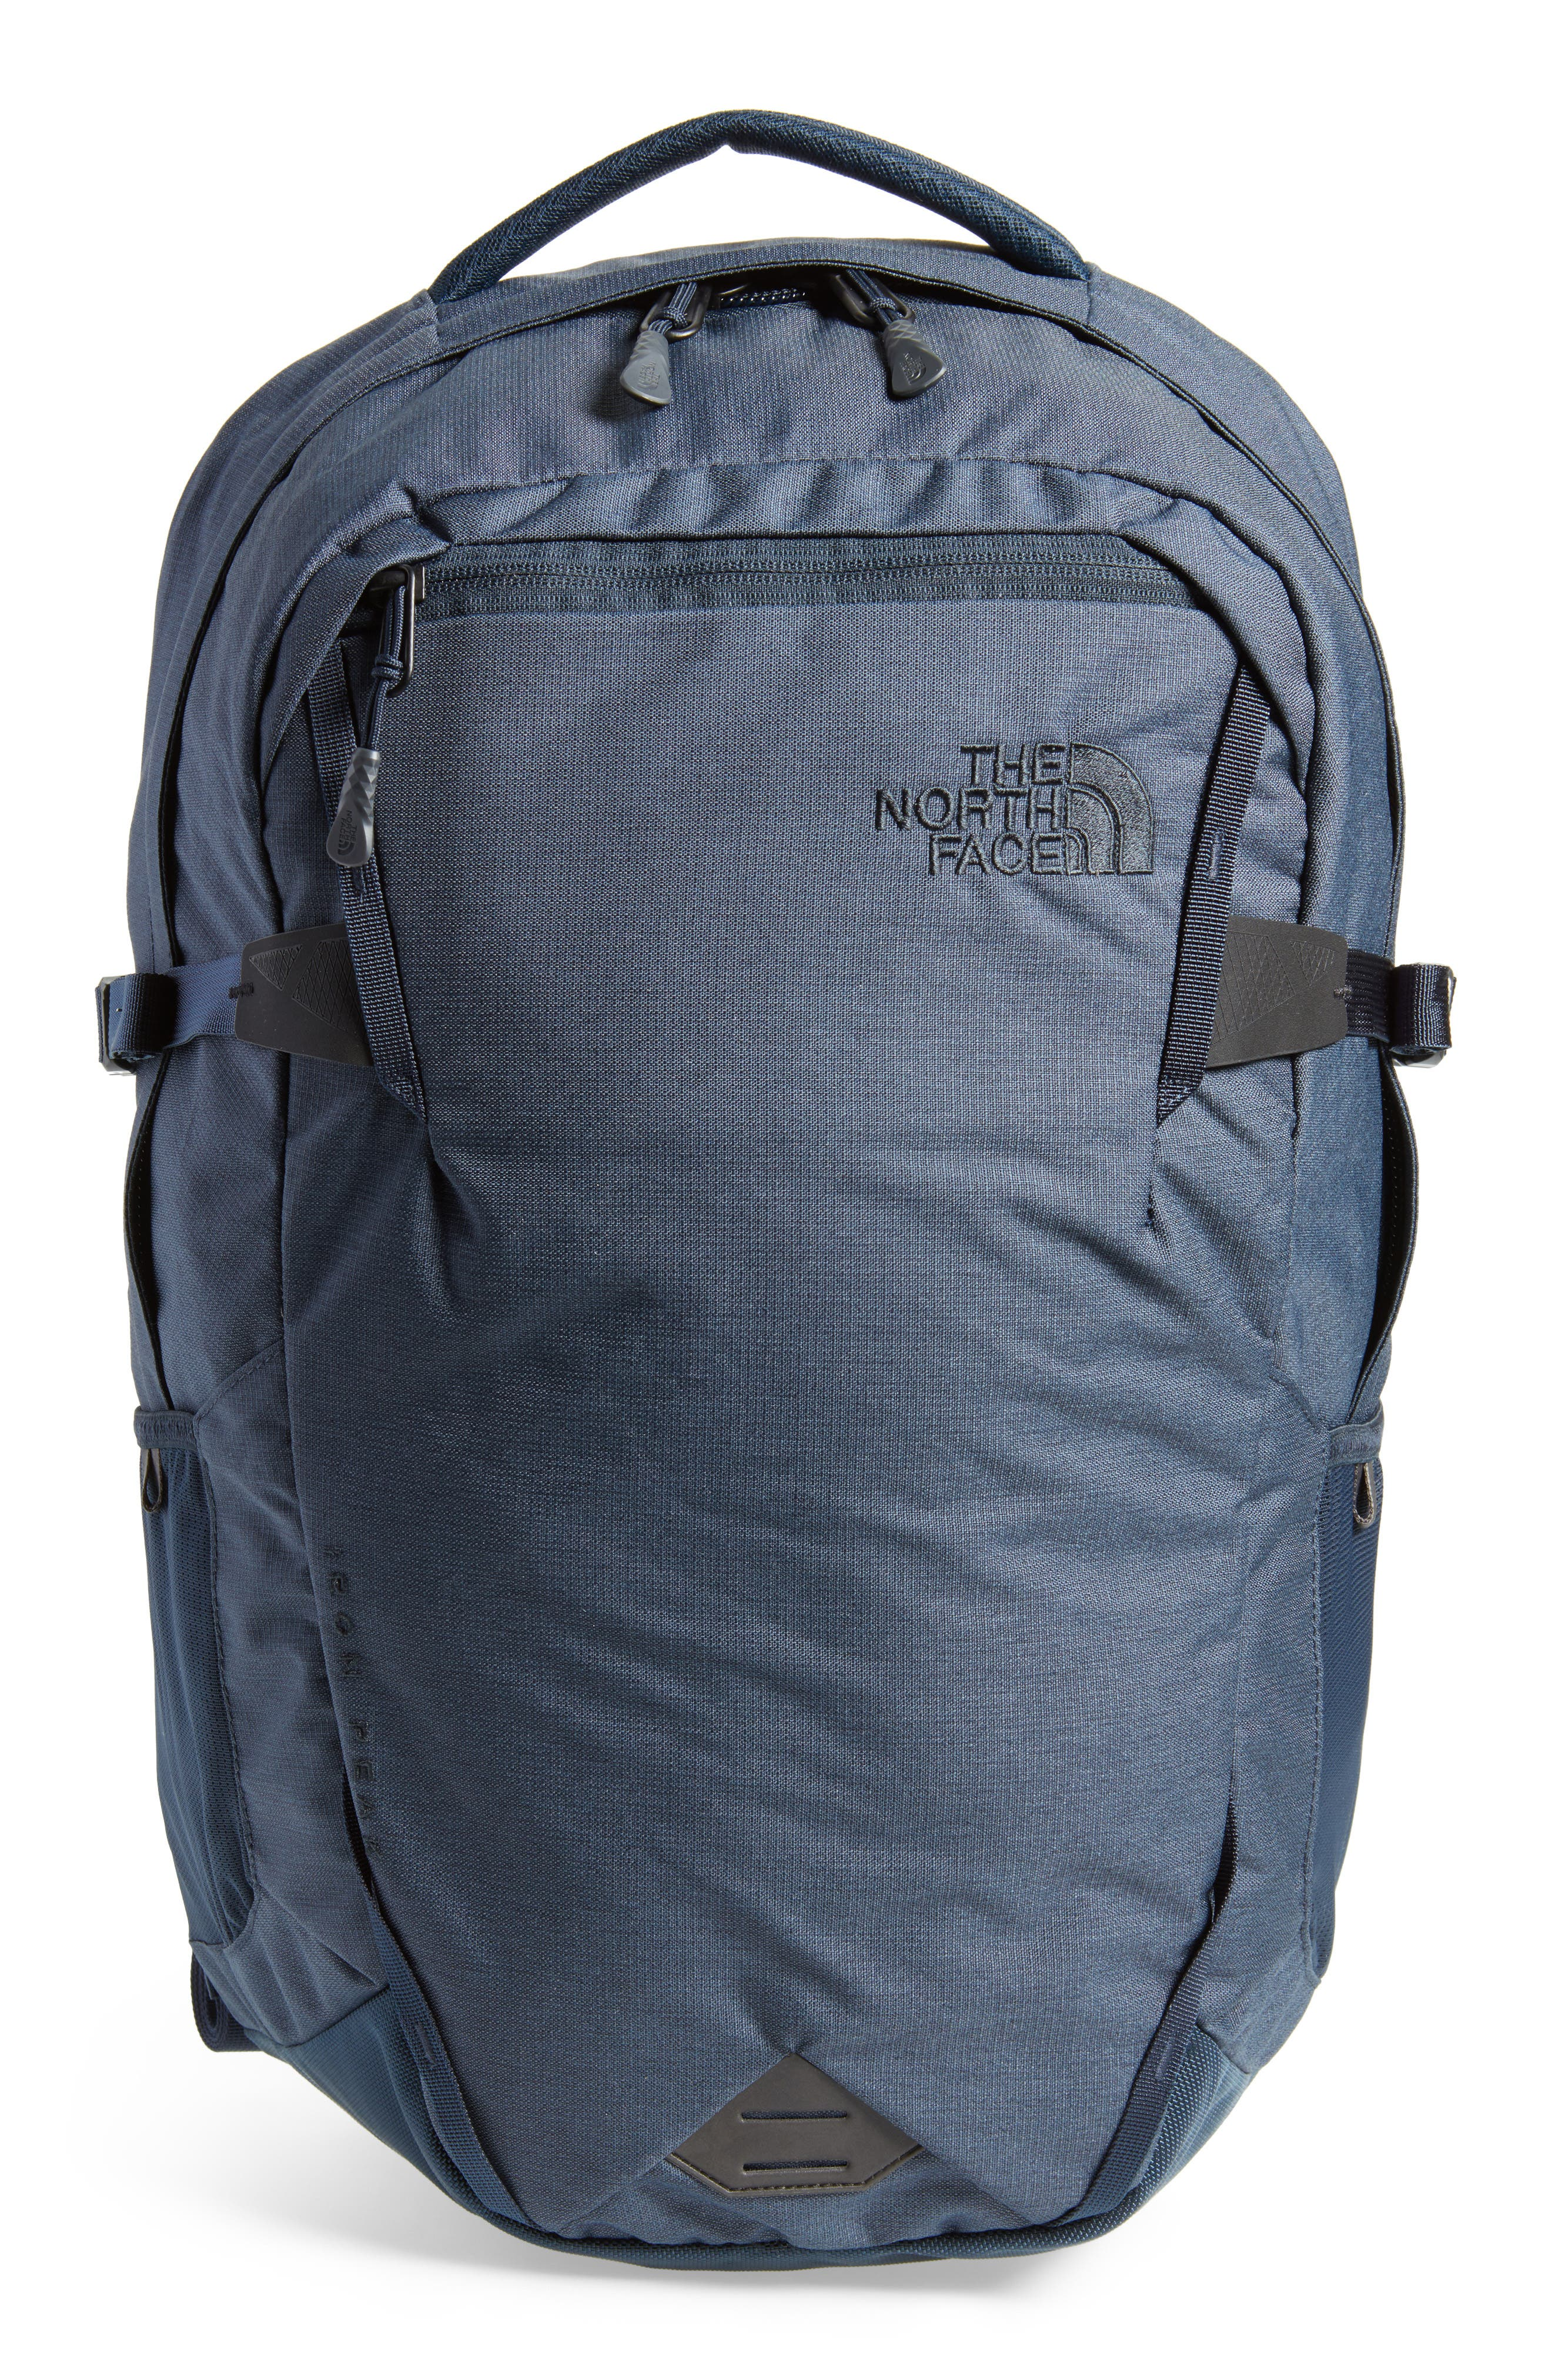 Iron Peak Backpack,                             Main thumbnail 3, color,